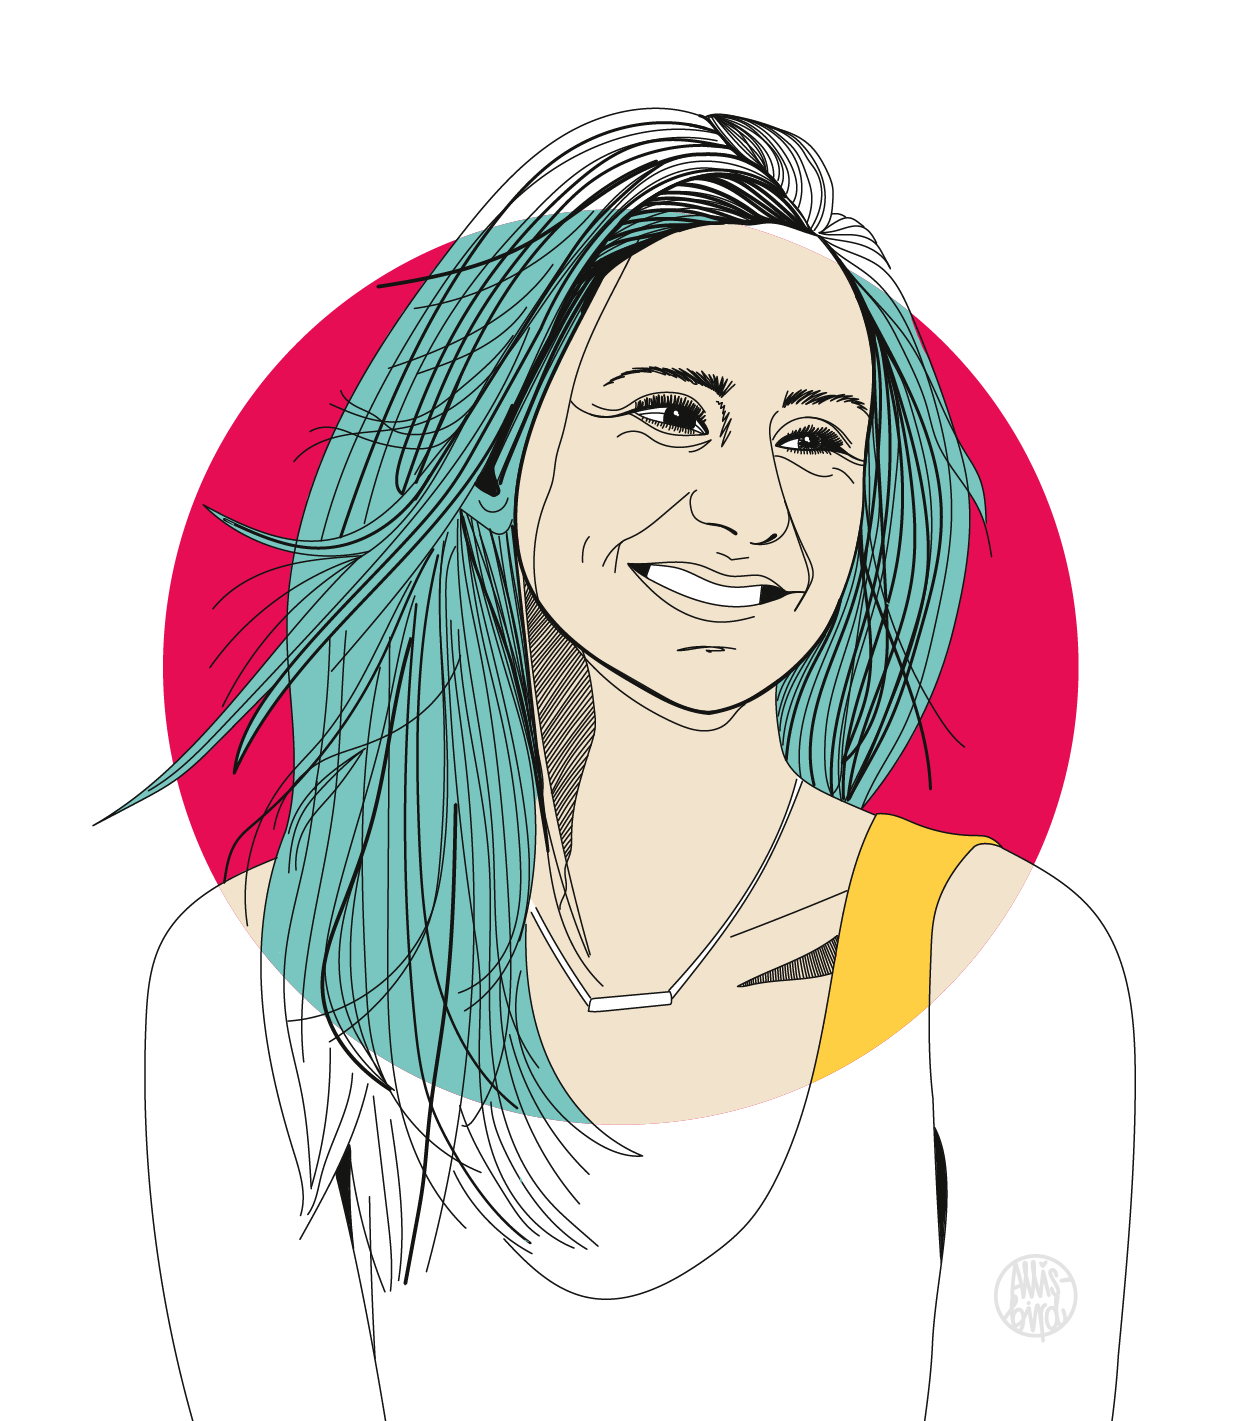 portrait-illustration-grafikdesign-laura-malina-seiler